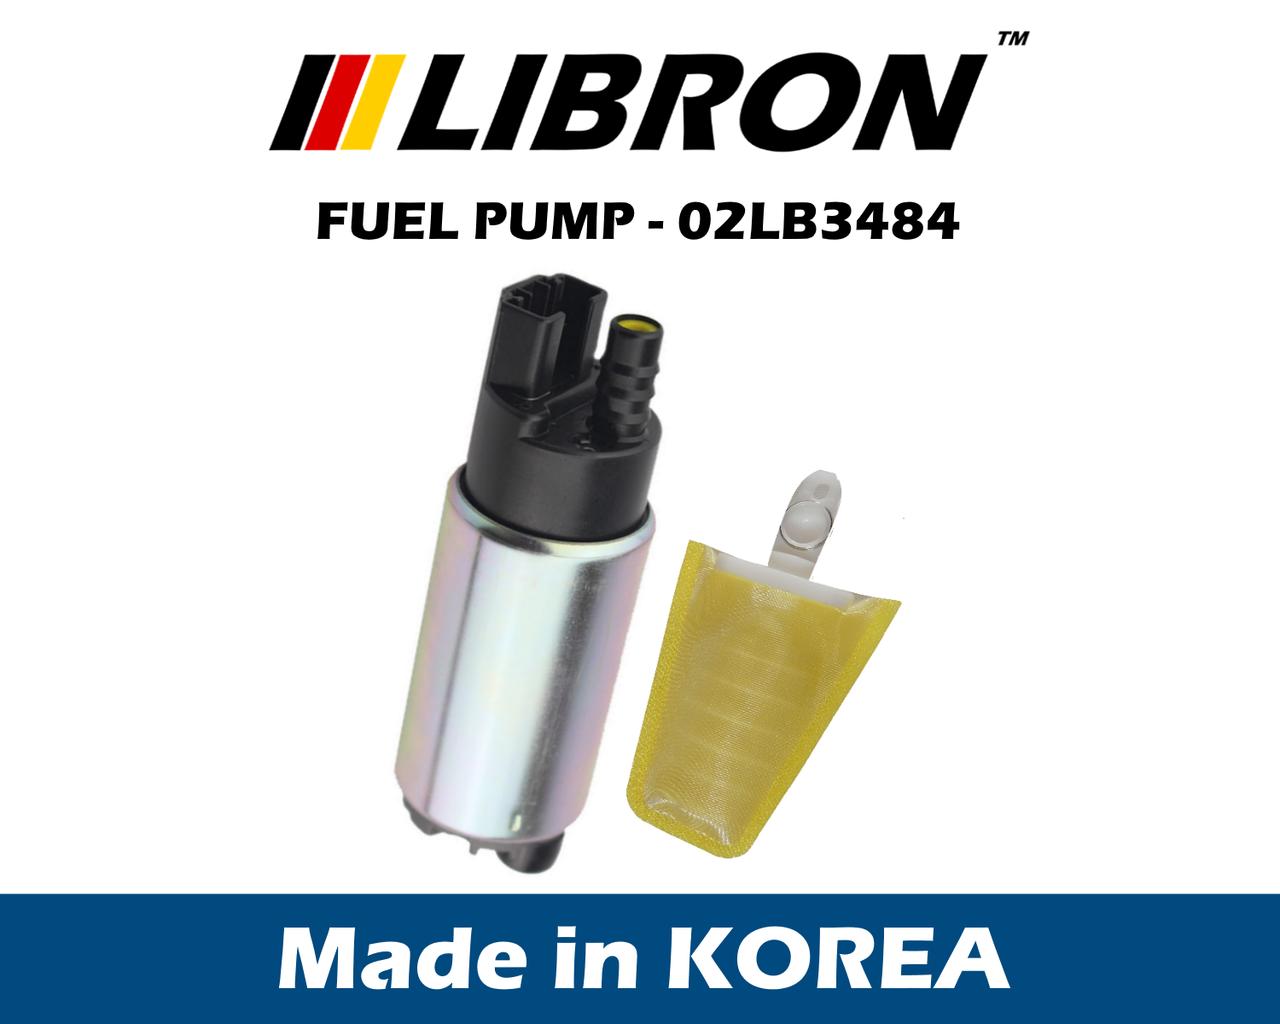 Бензонасос LIBRON 02LB3484 - Хонда Акорд Аккорд V Aerodeck